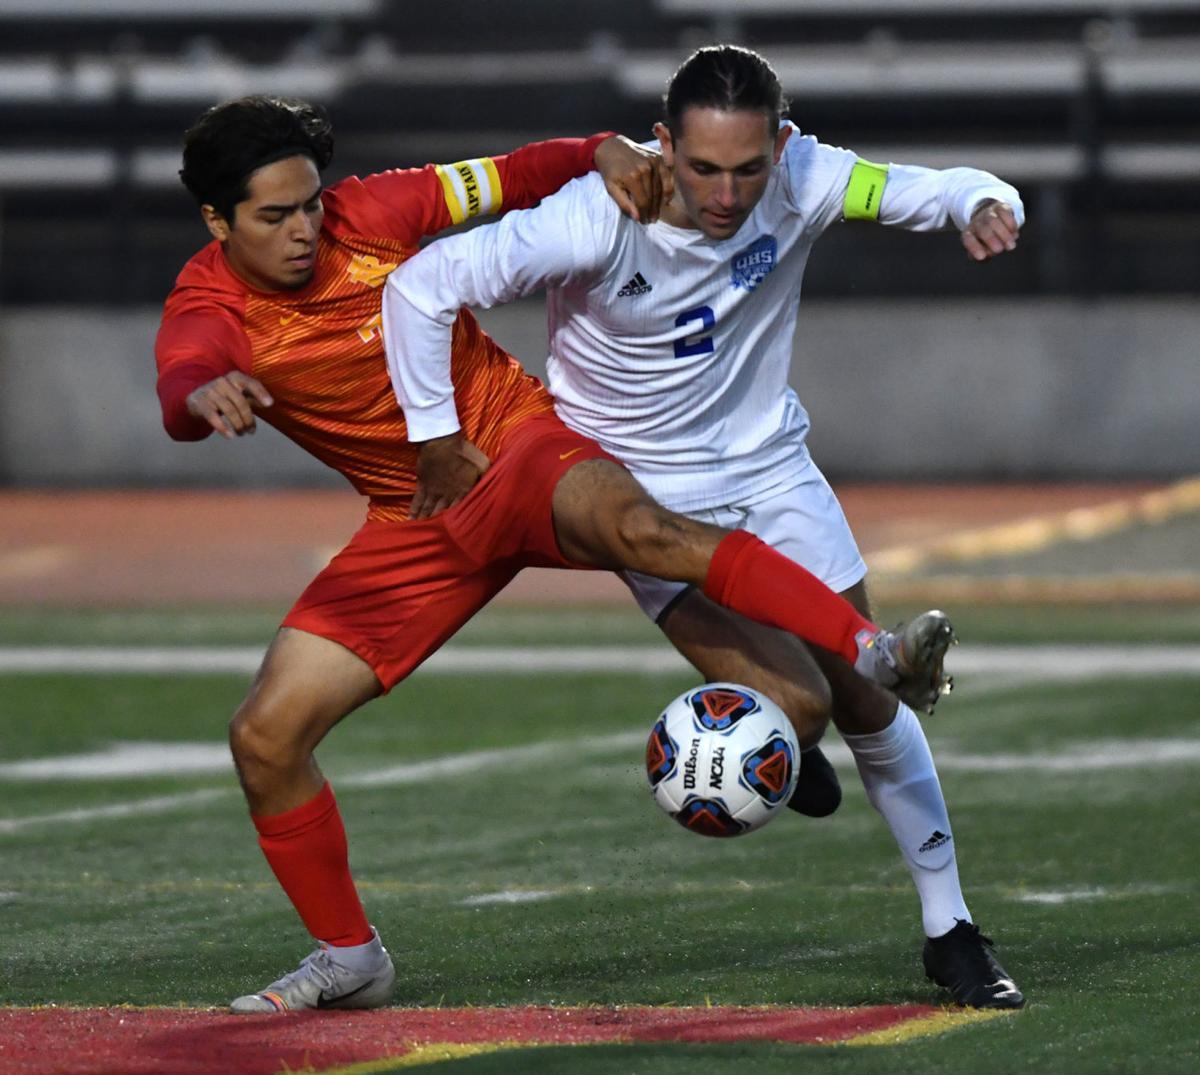 Quincy vs Rock Island boys soccer